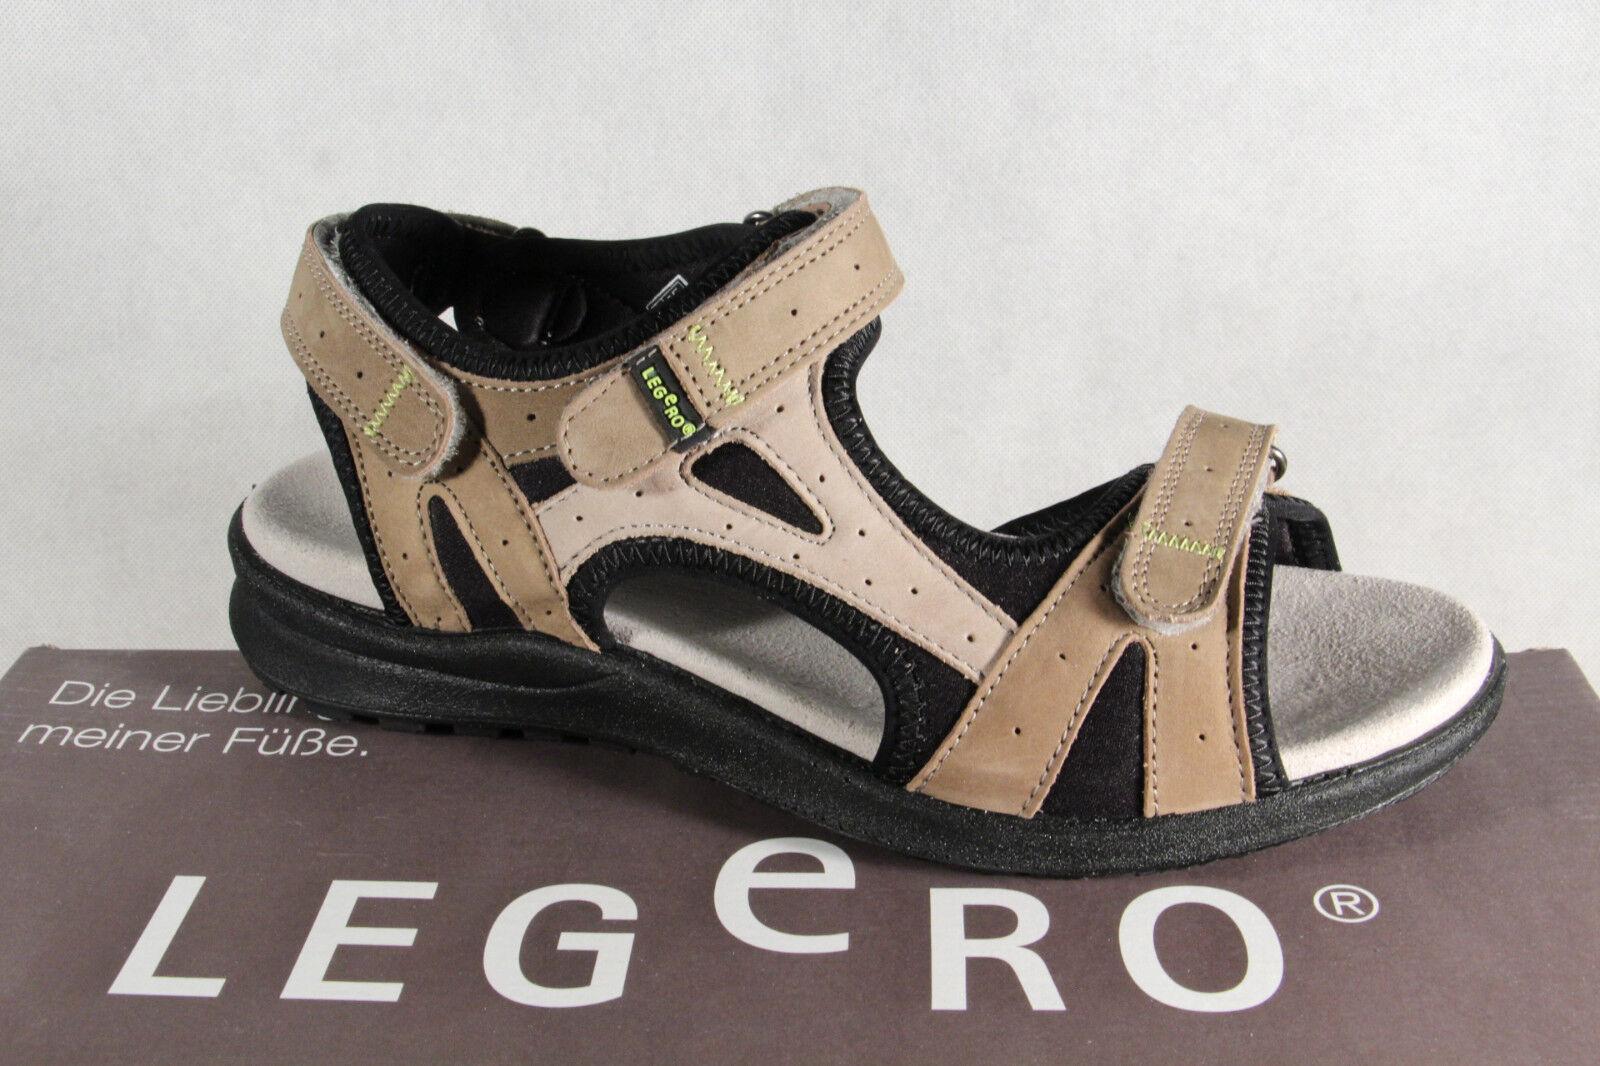 Rieker Damen Sandalen Sandaletten schwarz KV weiches Innenfu bett 68851 NEU